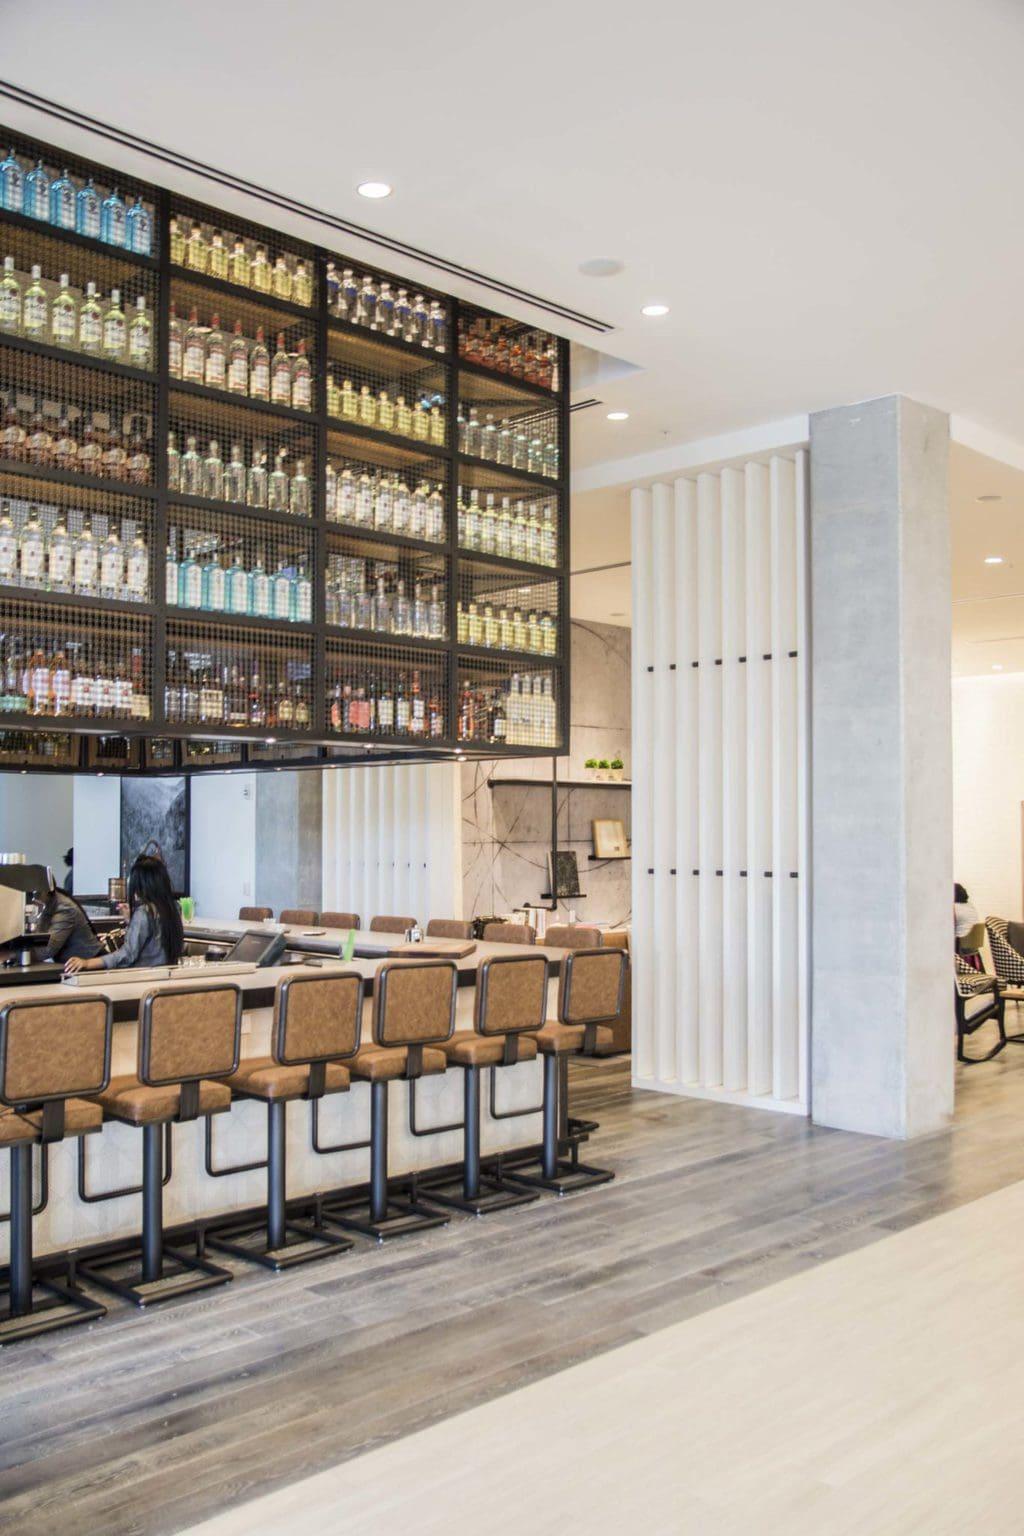 Modern bar design at the Renaissance airport Atlanta hotel on Thou Swell @thouswellblog